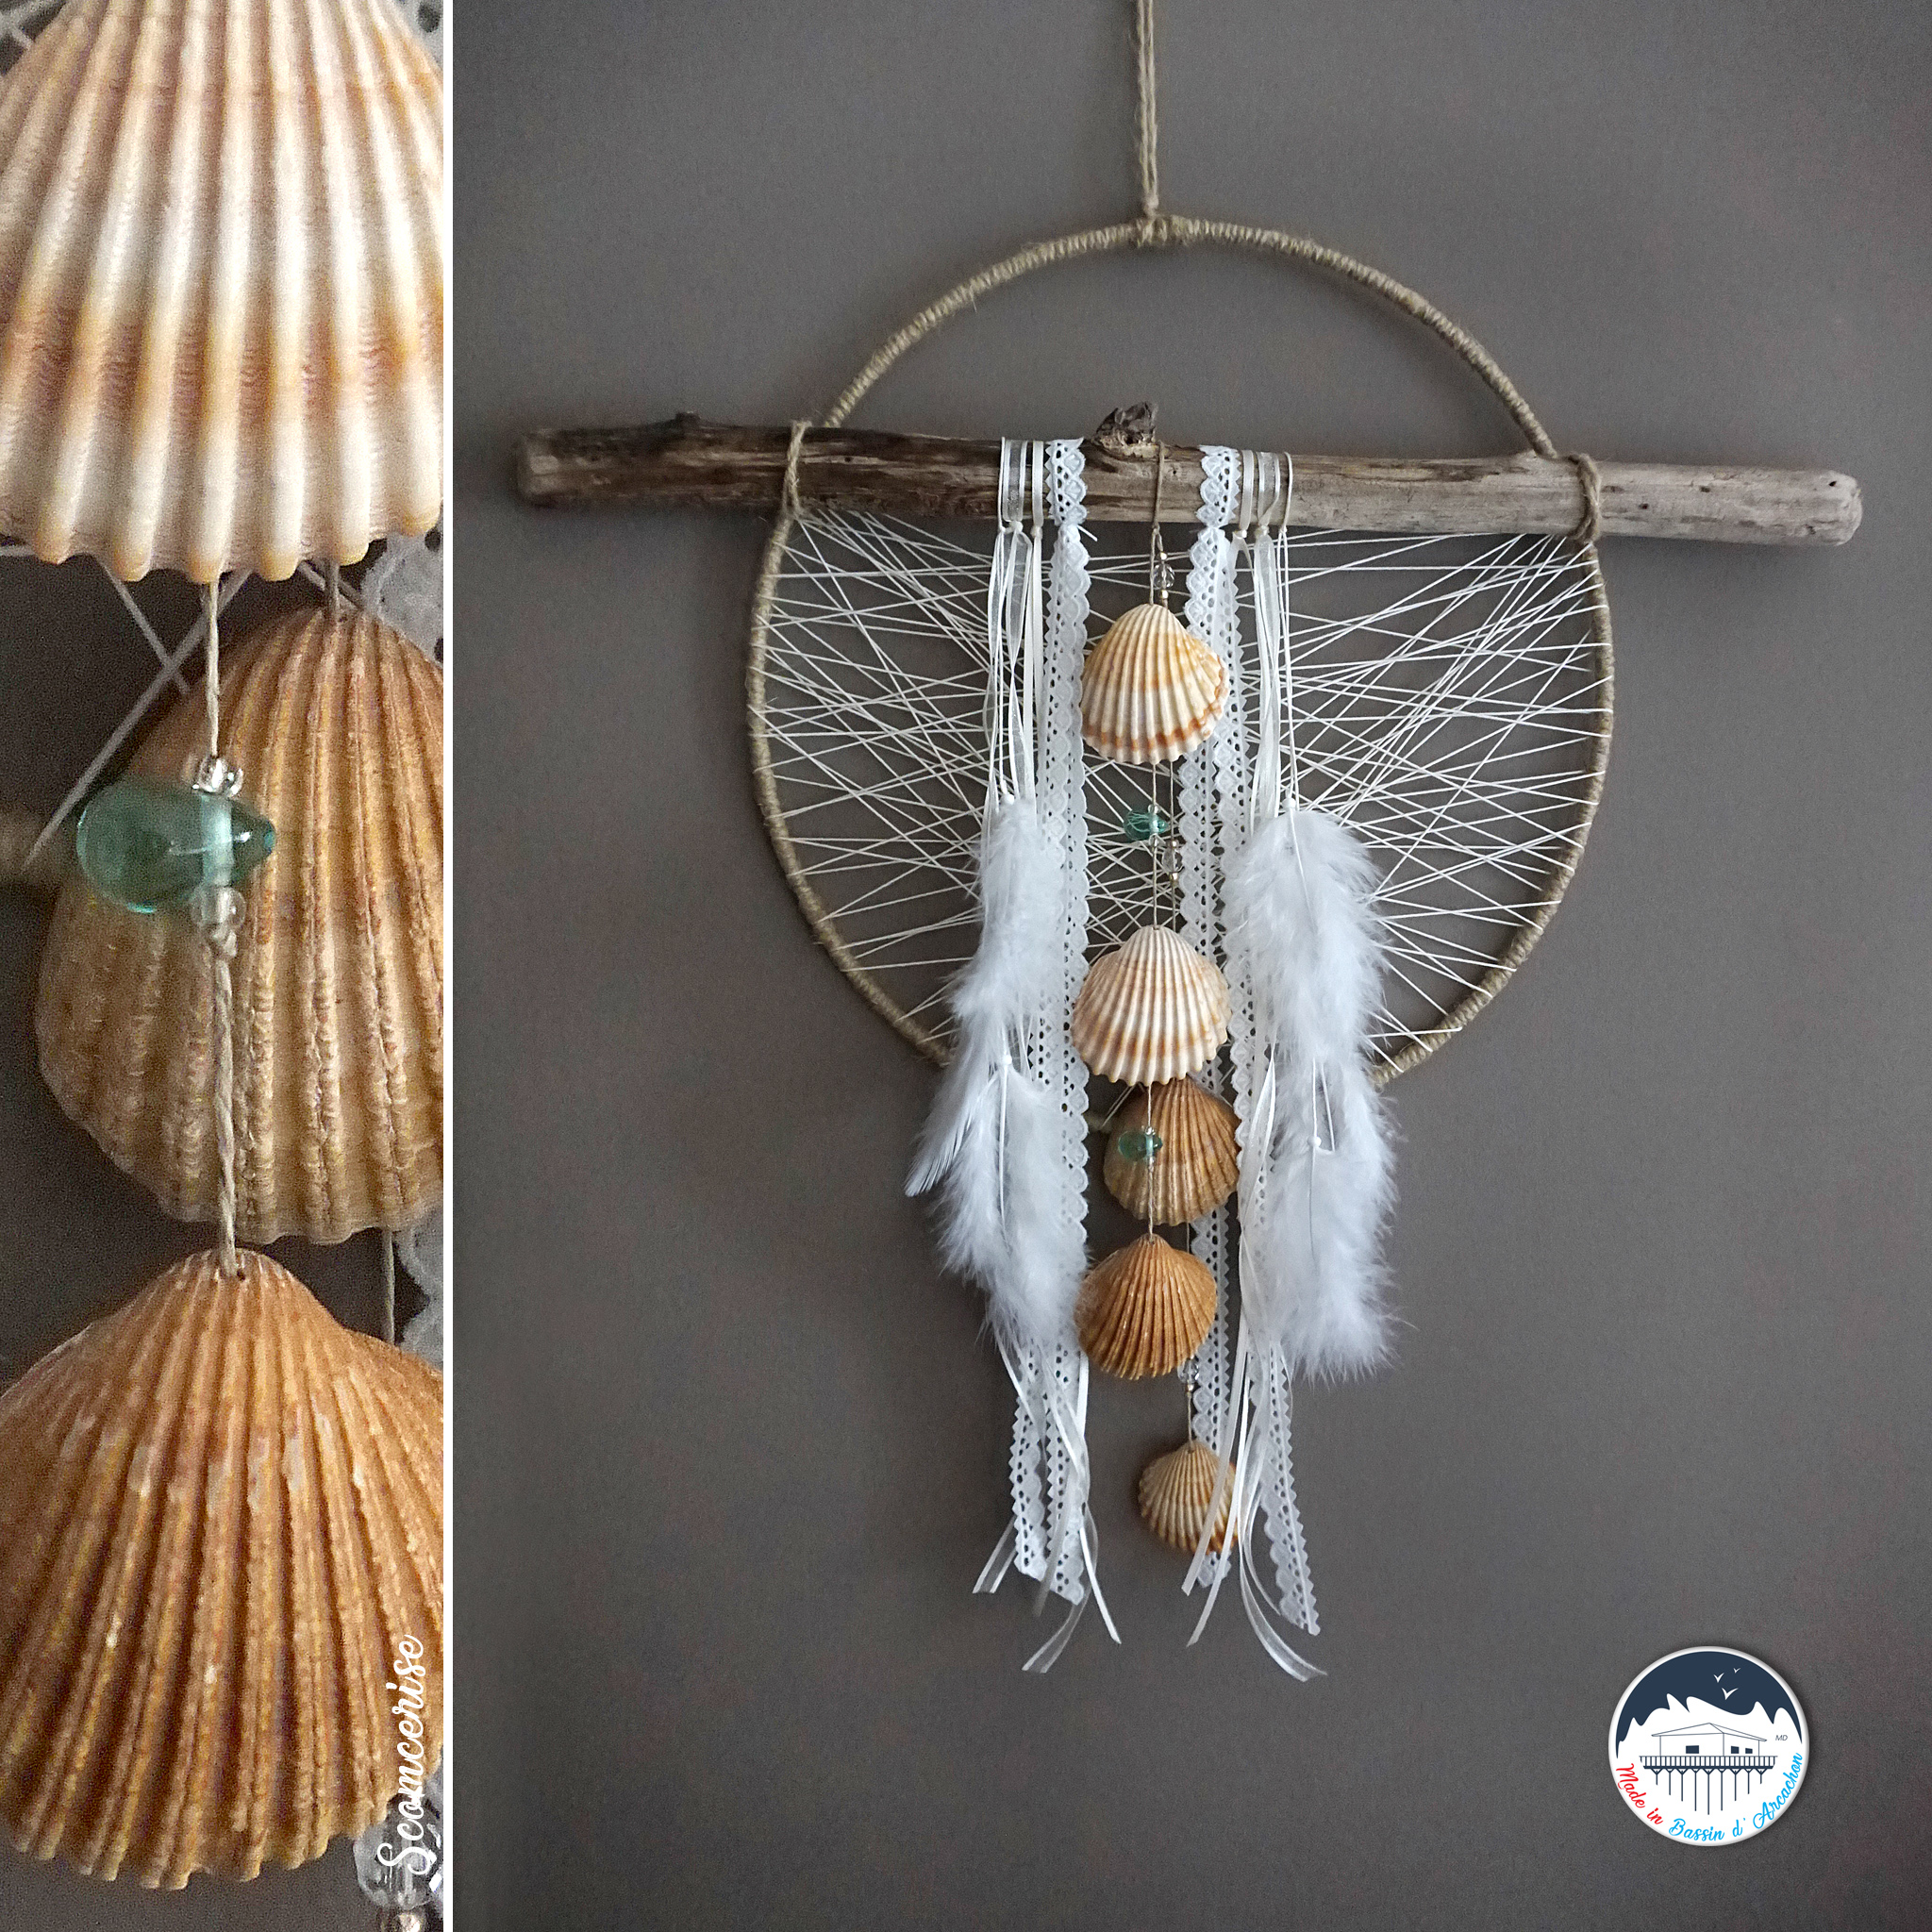 Attrape-rêves Made in Bassin d'Arcachon